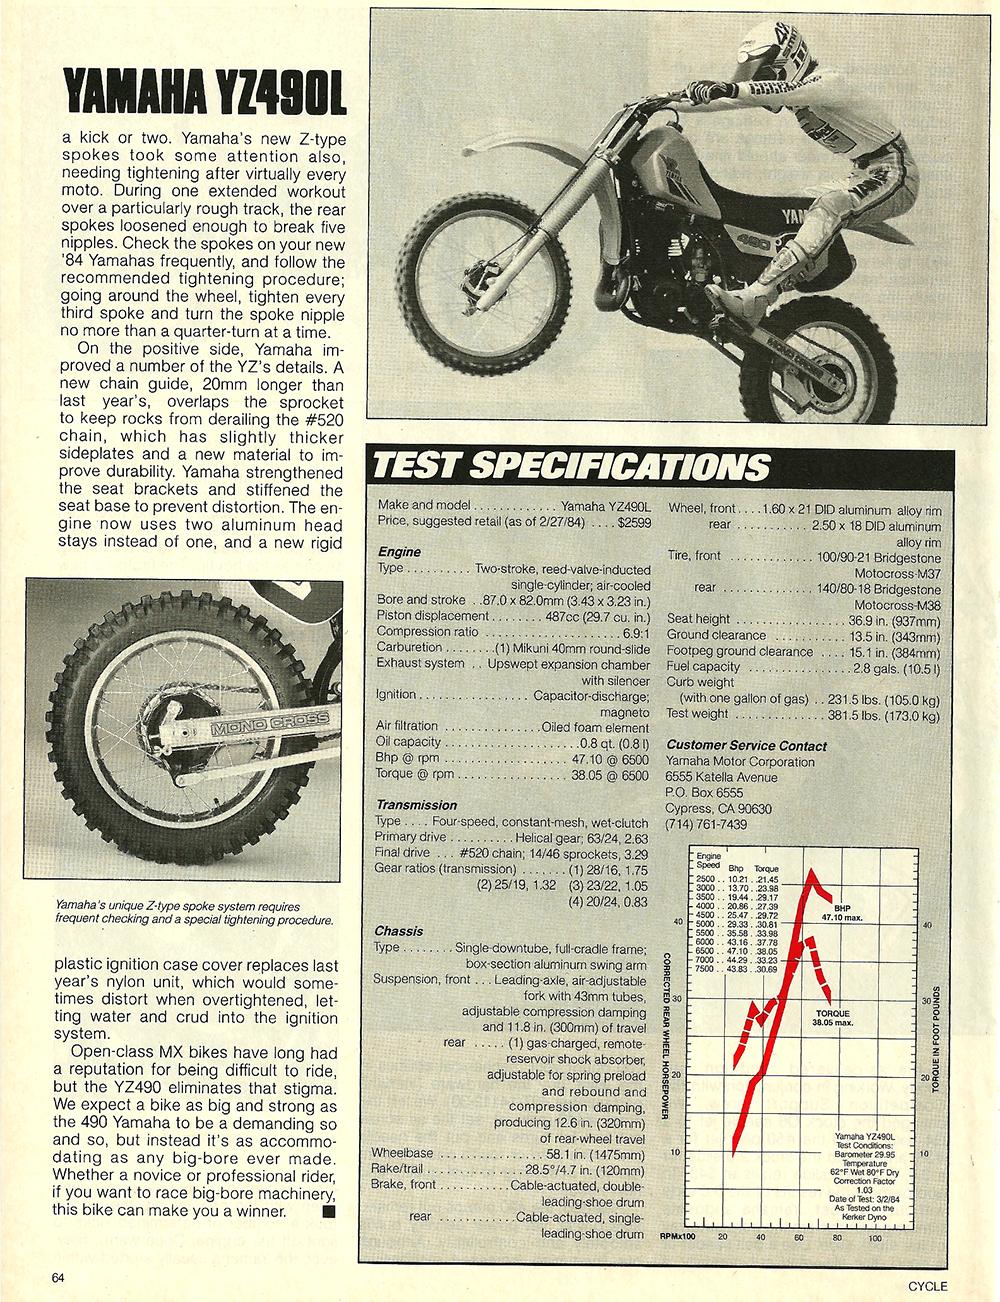 1984 Yamaha YZ490L off road test 7.jpg